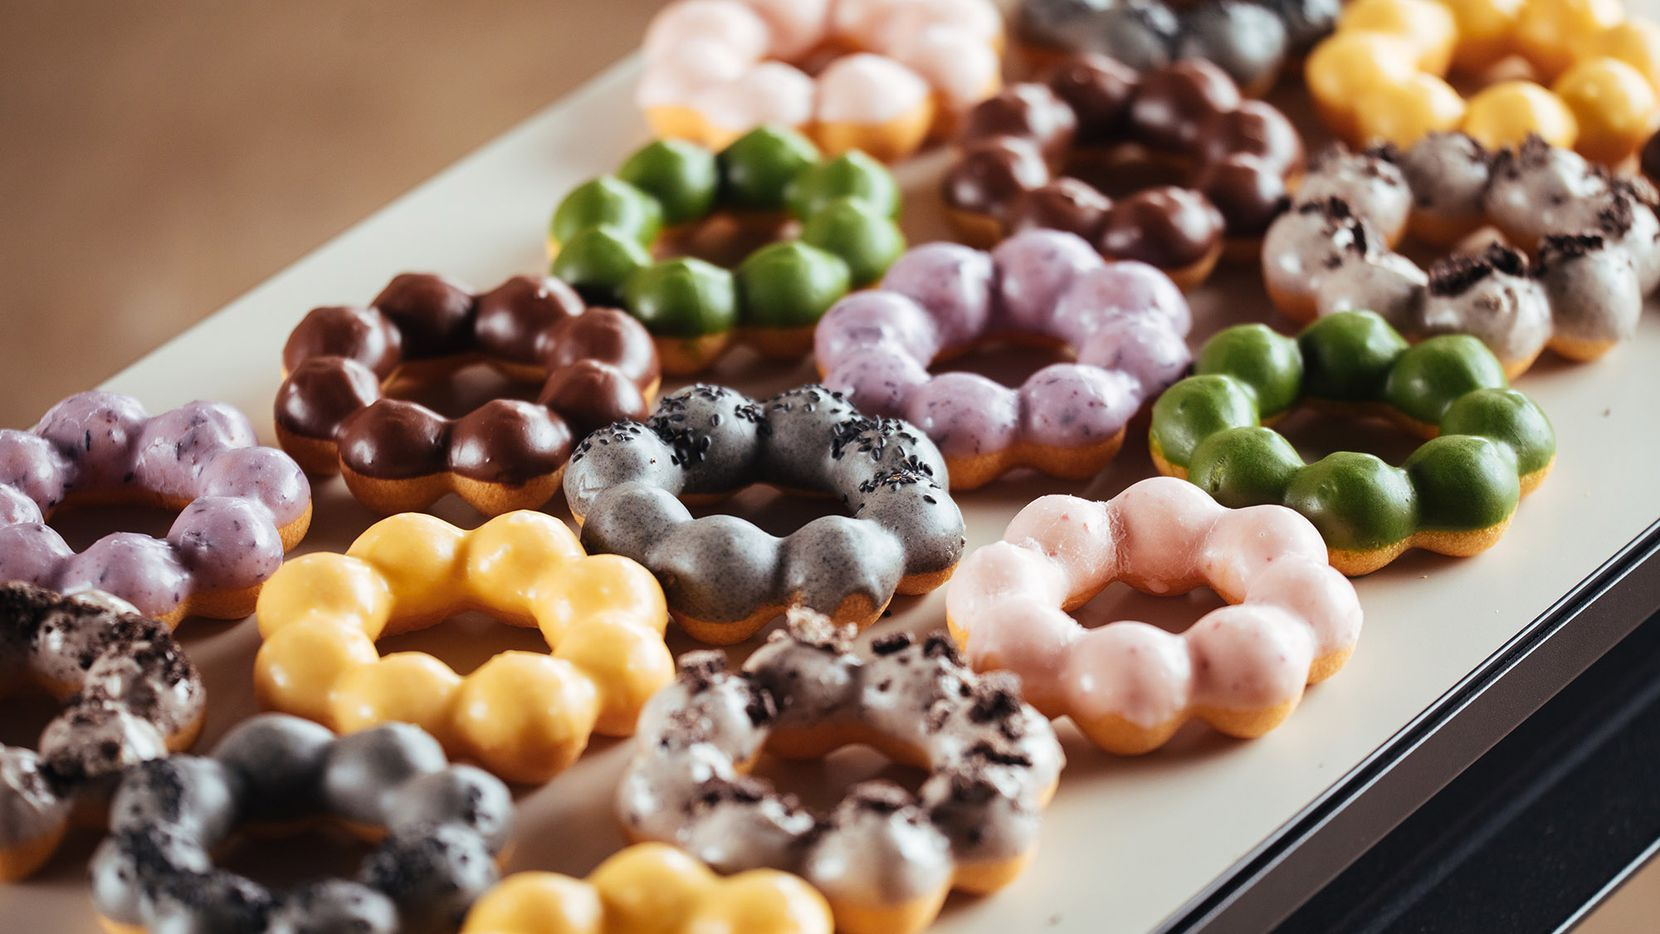 Fat Straws in Richardson will sell mochi doughnuts and bubble tea.